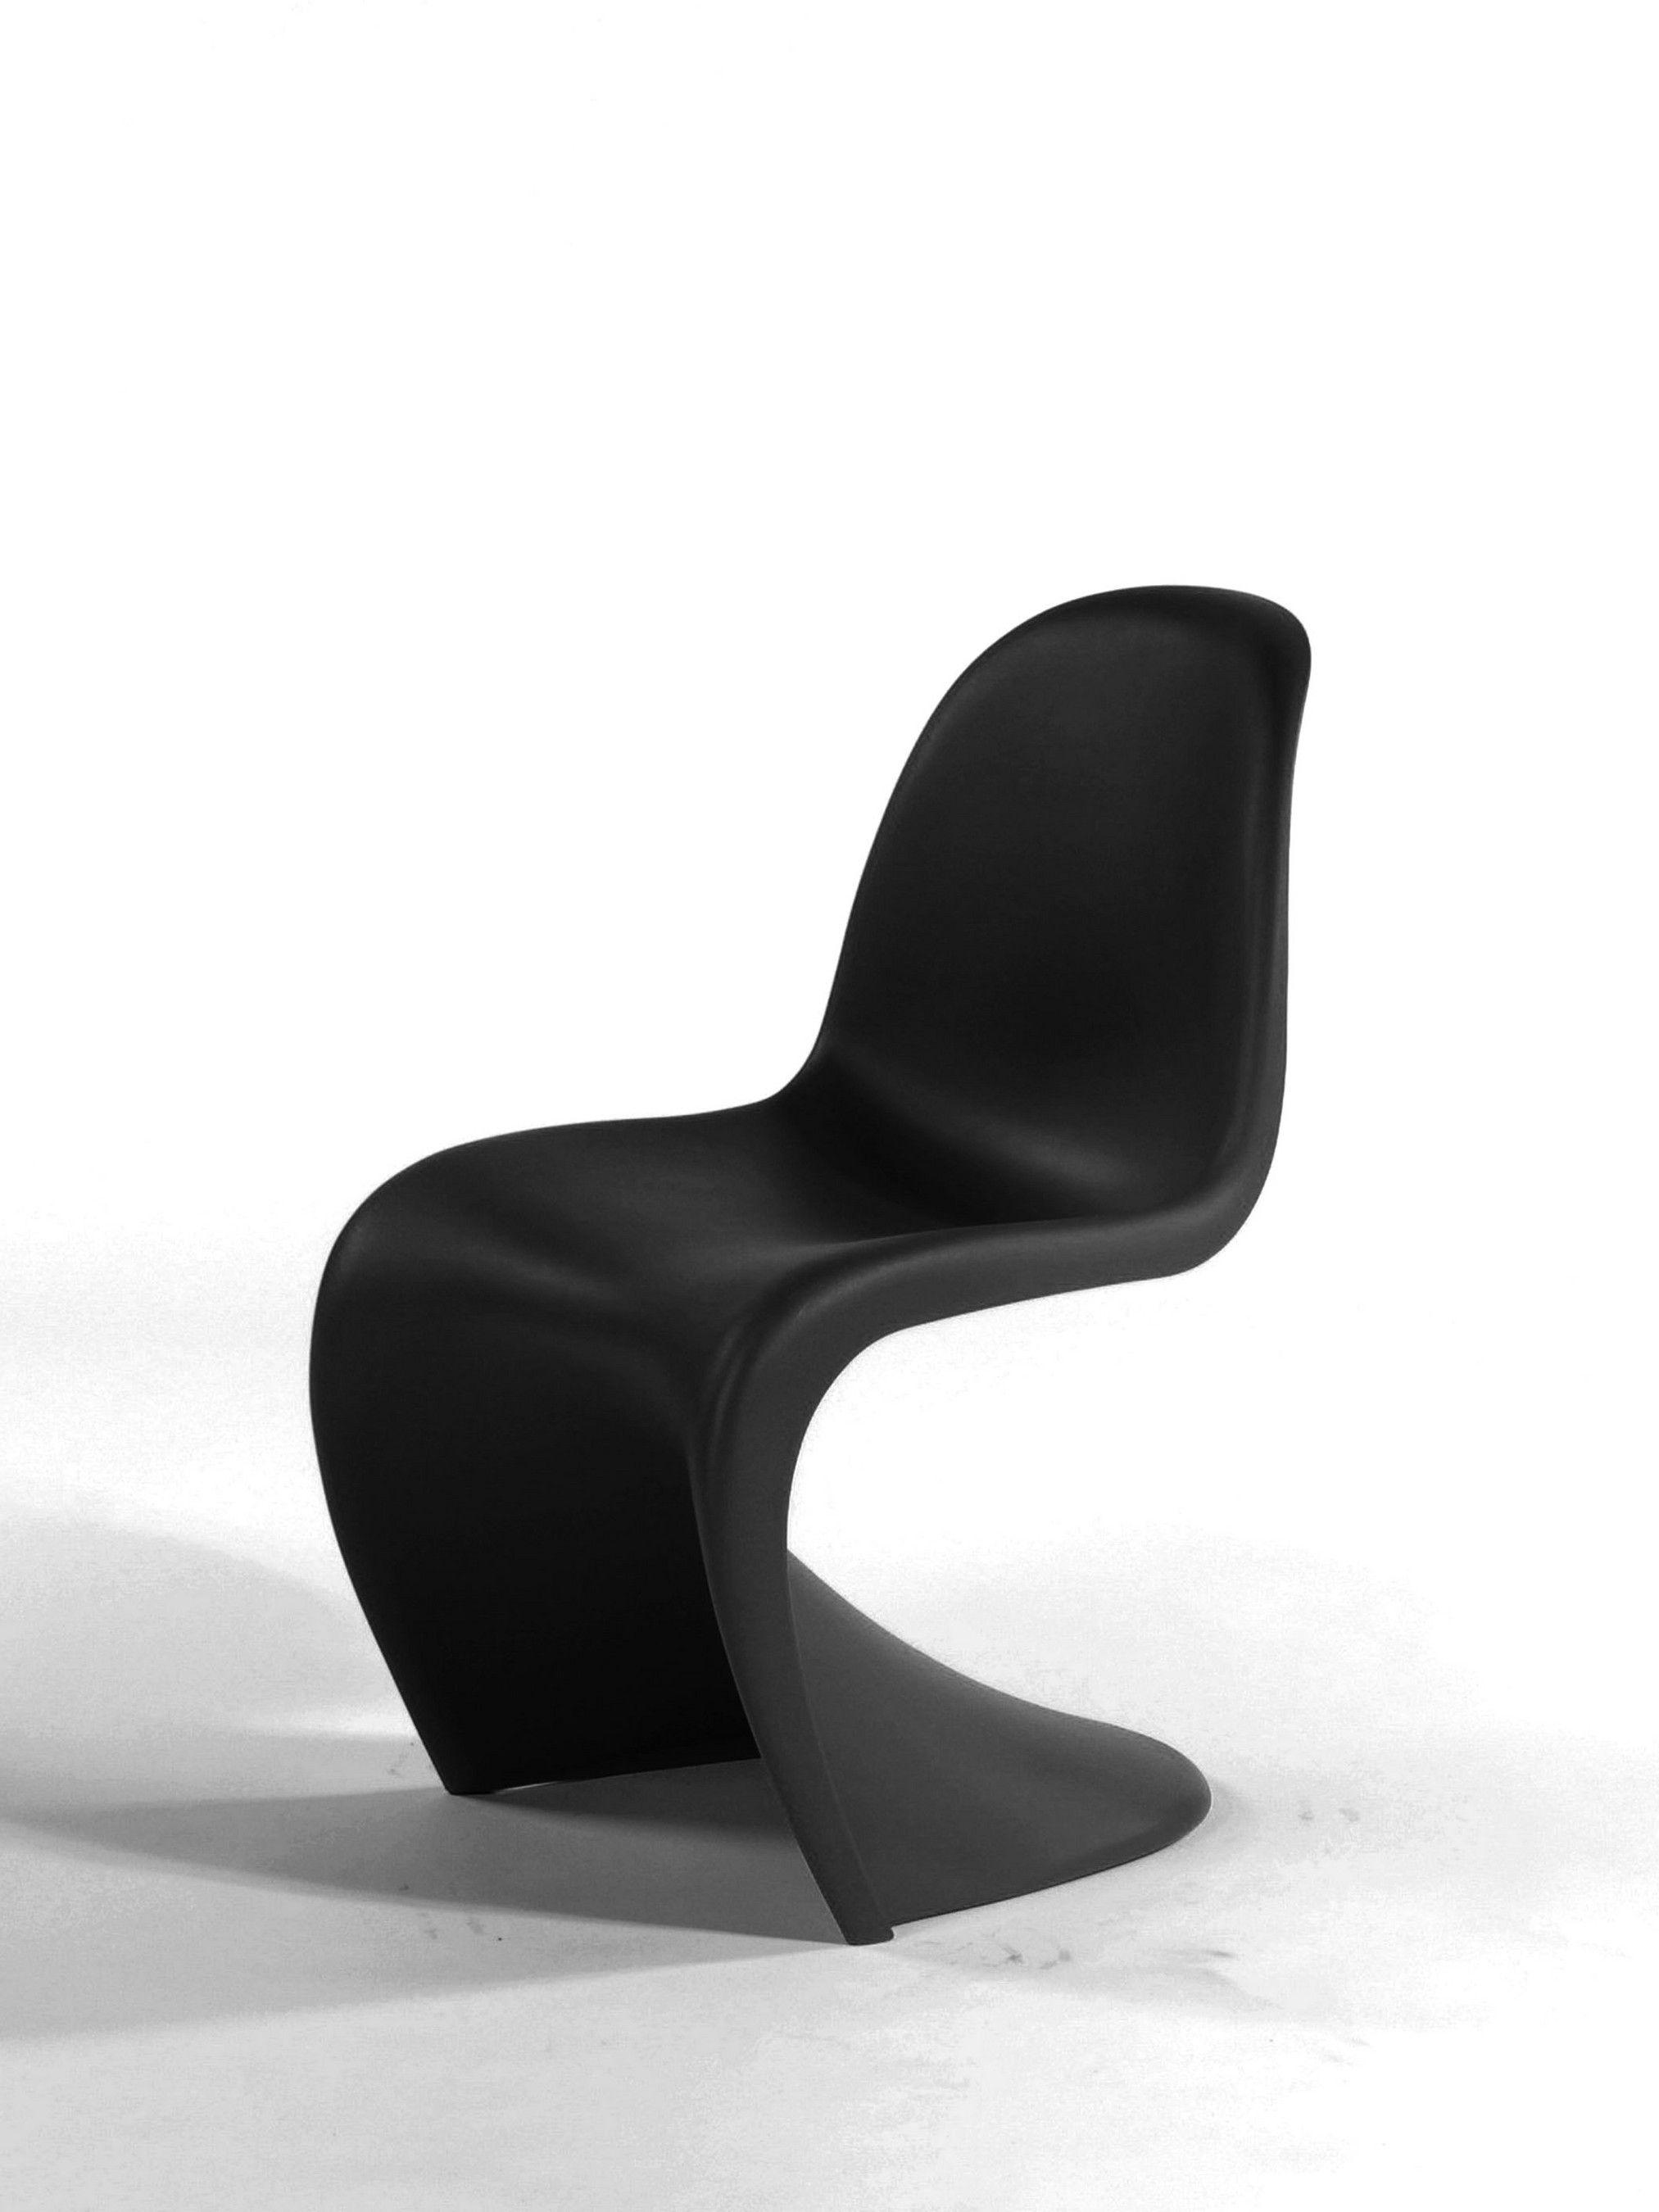 Verner panton panton chair vitra collection black